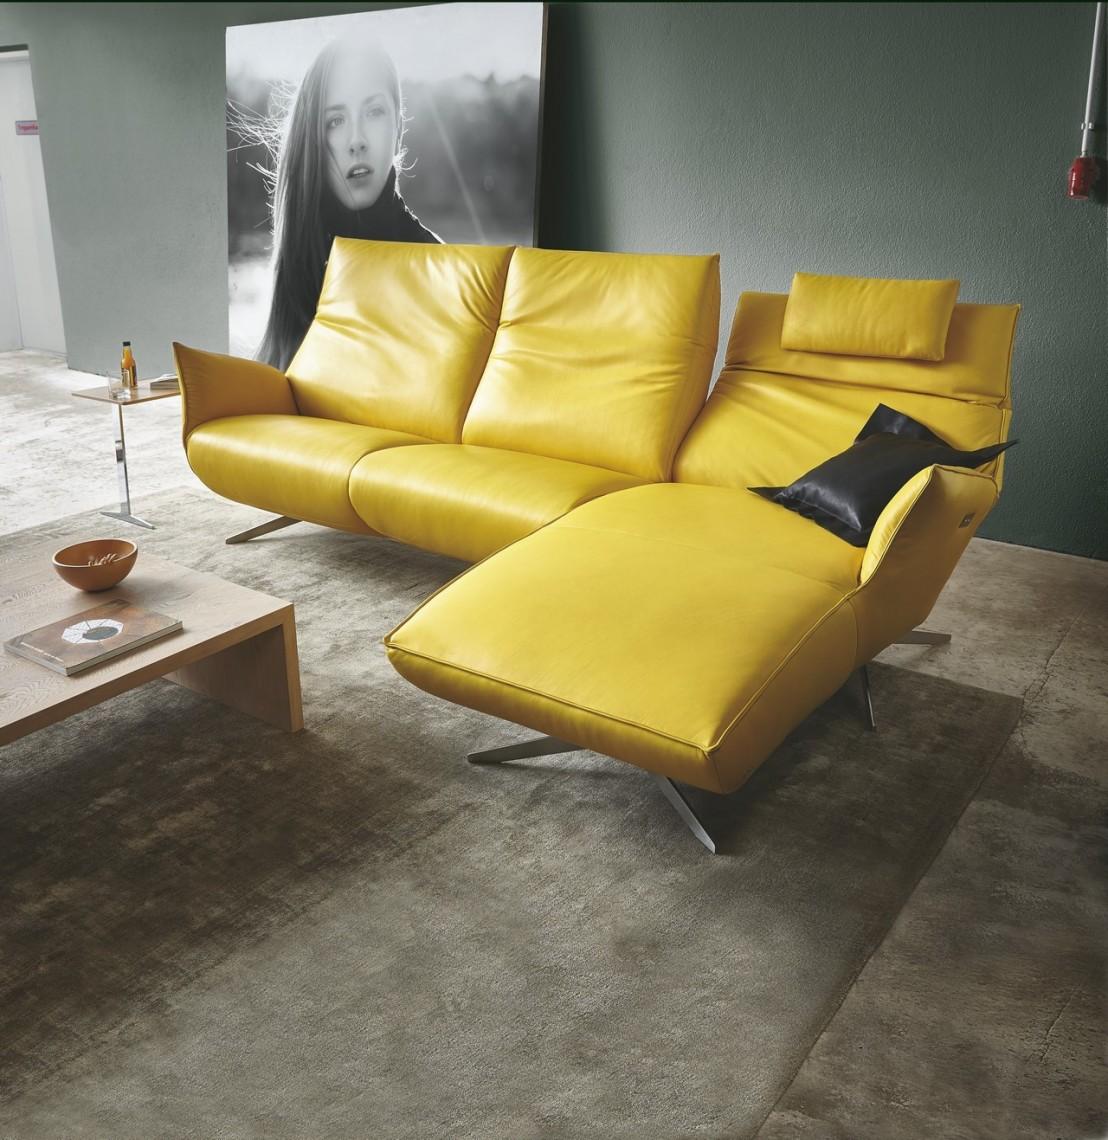 pur design pur confort pur relax. Black Bedroom Furniture Sets. Home Design Ideas